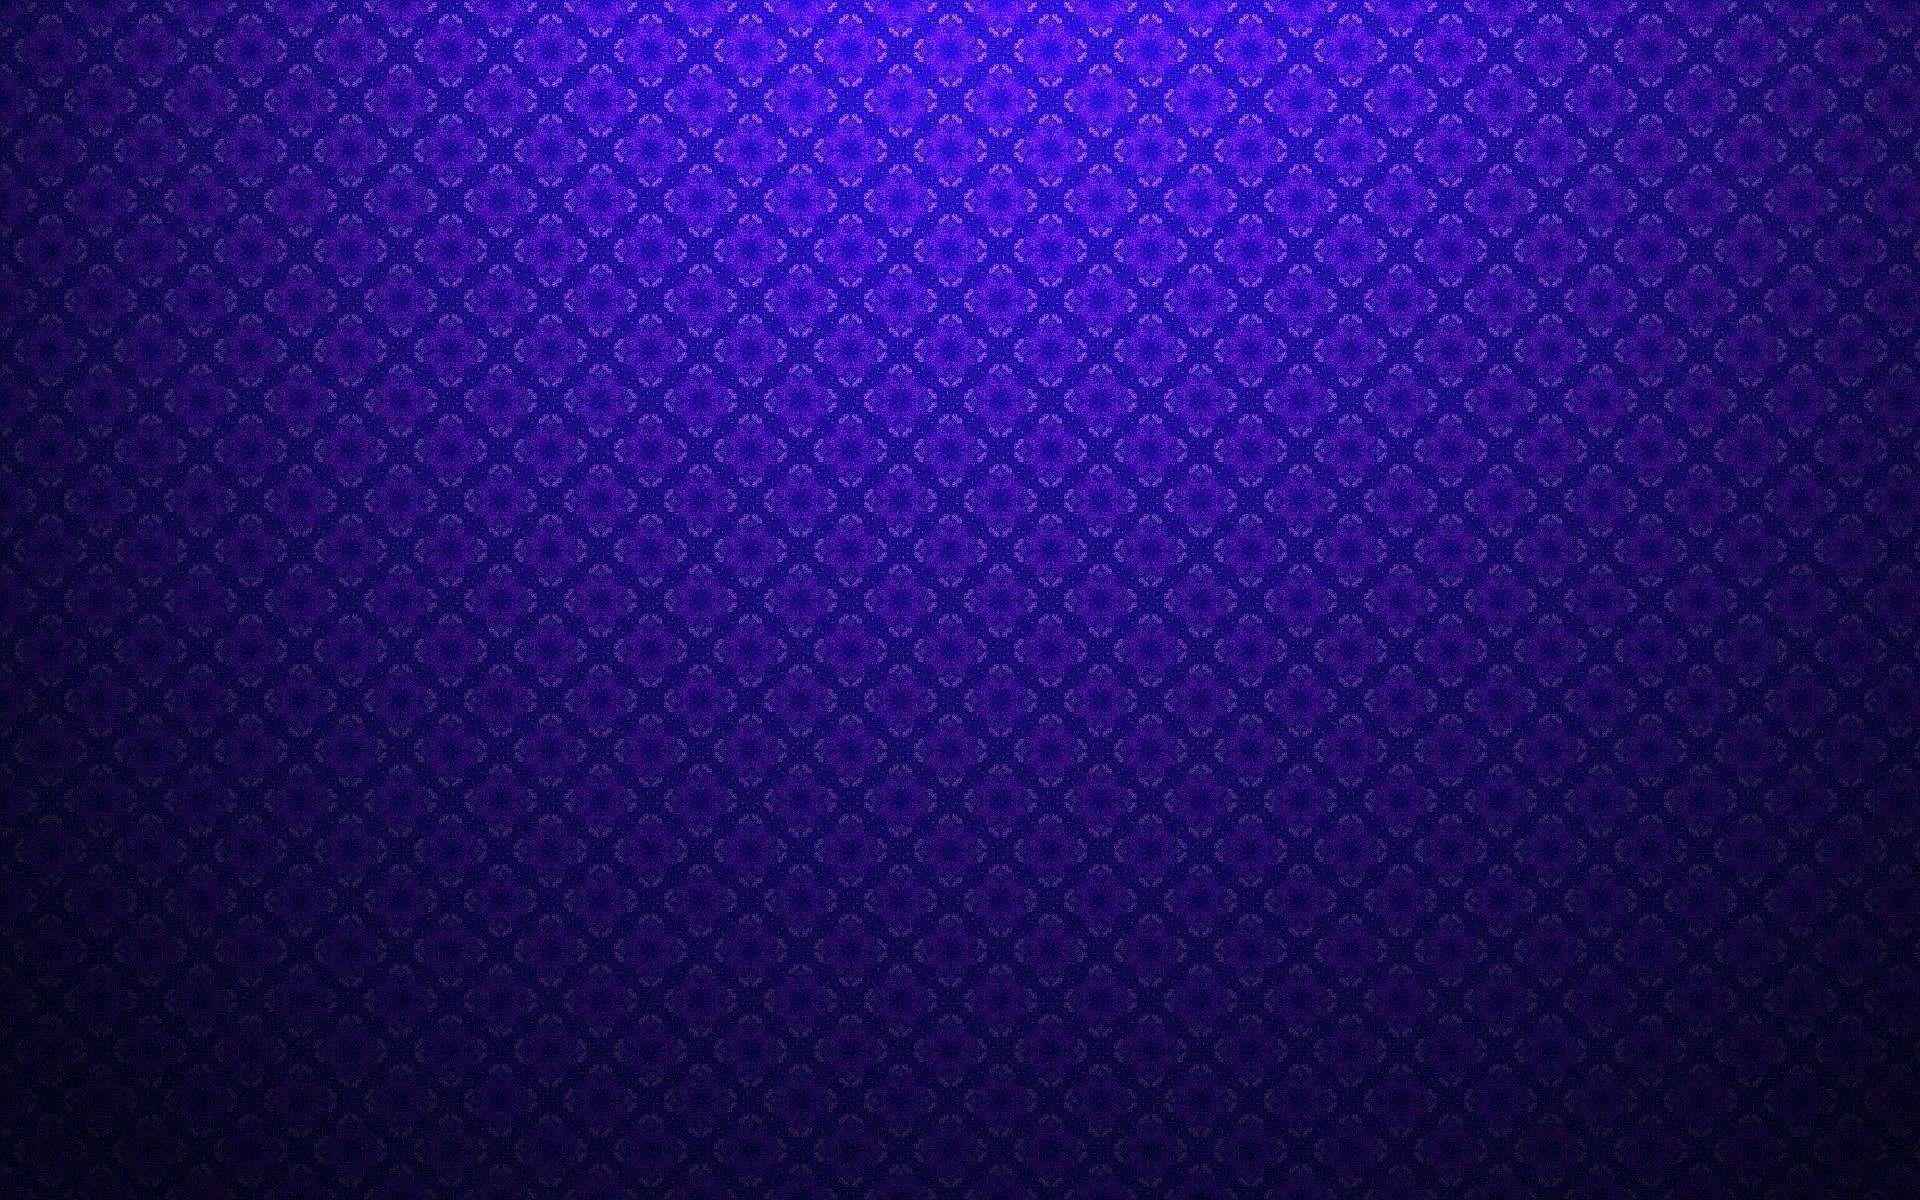 Black Wallpaper Hd 1366x768 Bakgrund Full Hd Bakgrund And Bakgrund 1920x1200 Id 371676